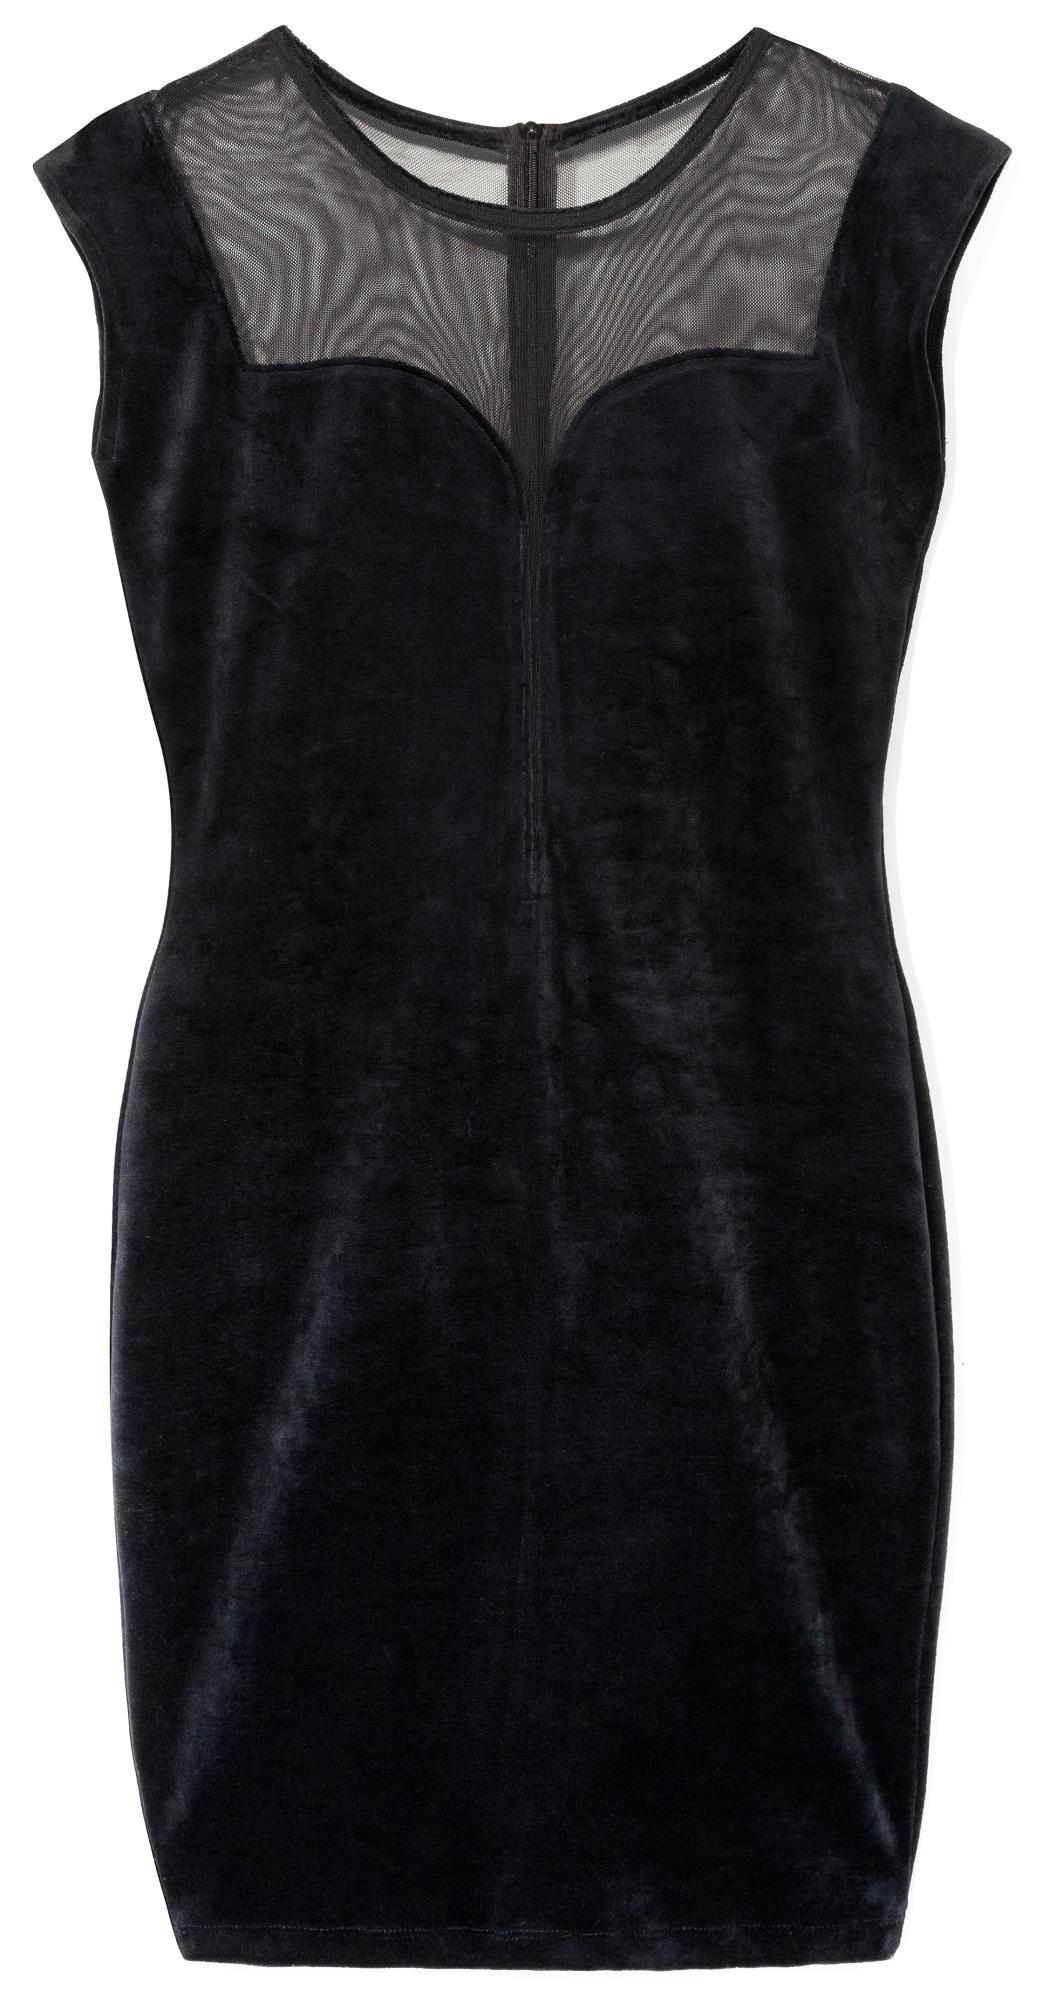 Sukienka - Mohito, kolekcja sylwestrowa